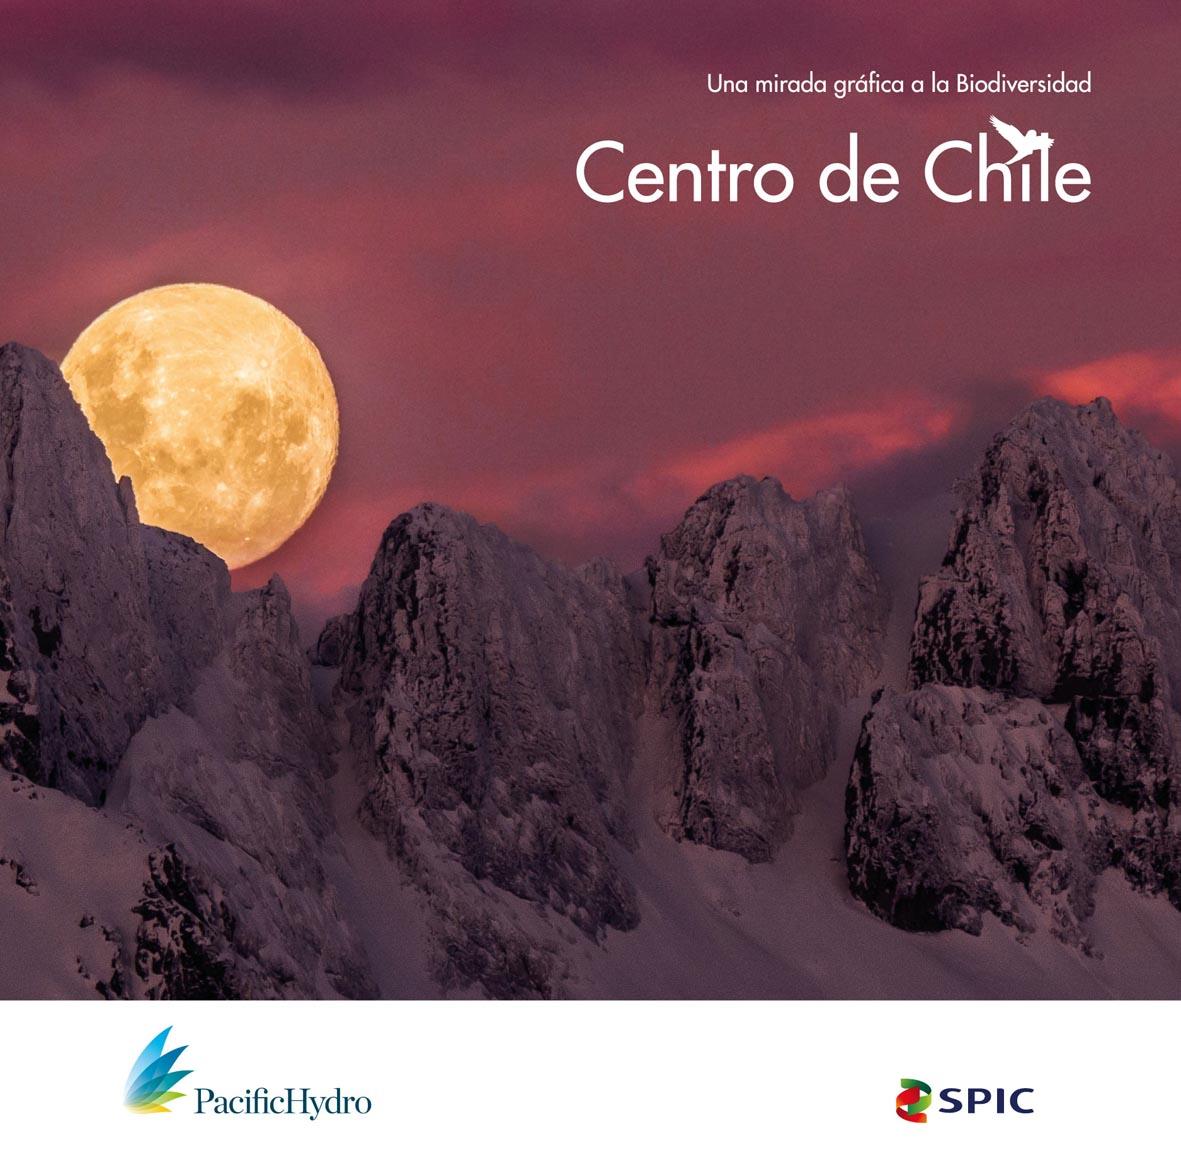 Biodiversidad Centro de Chile